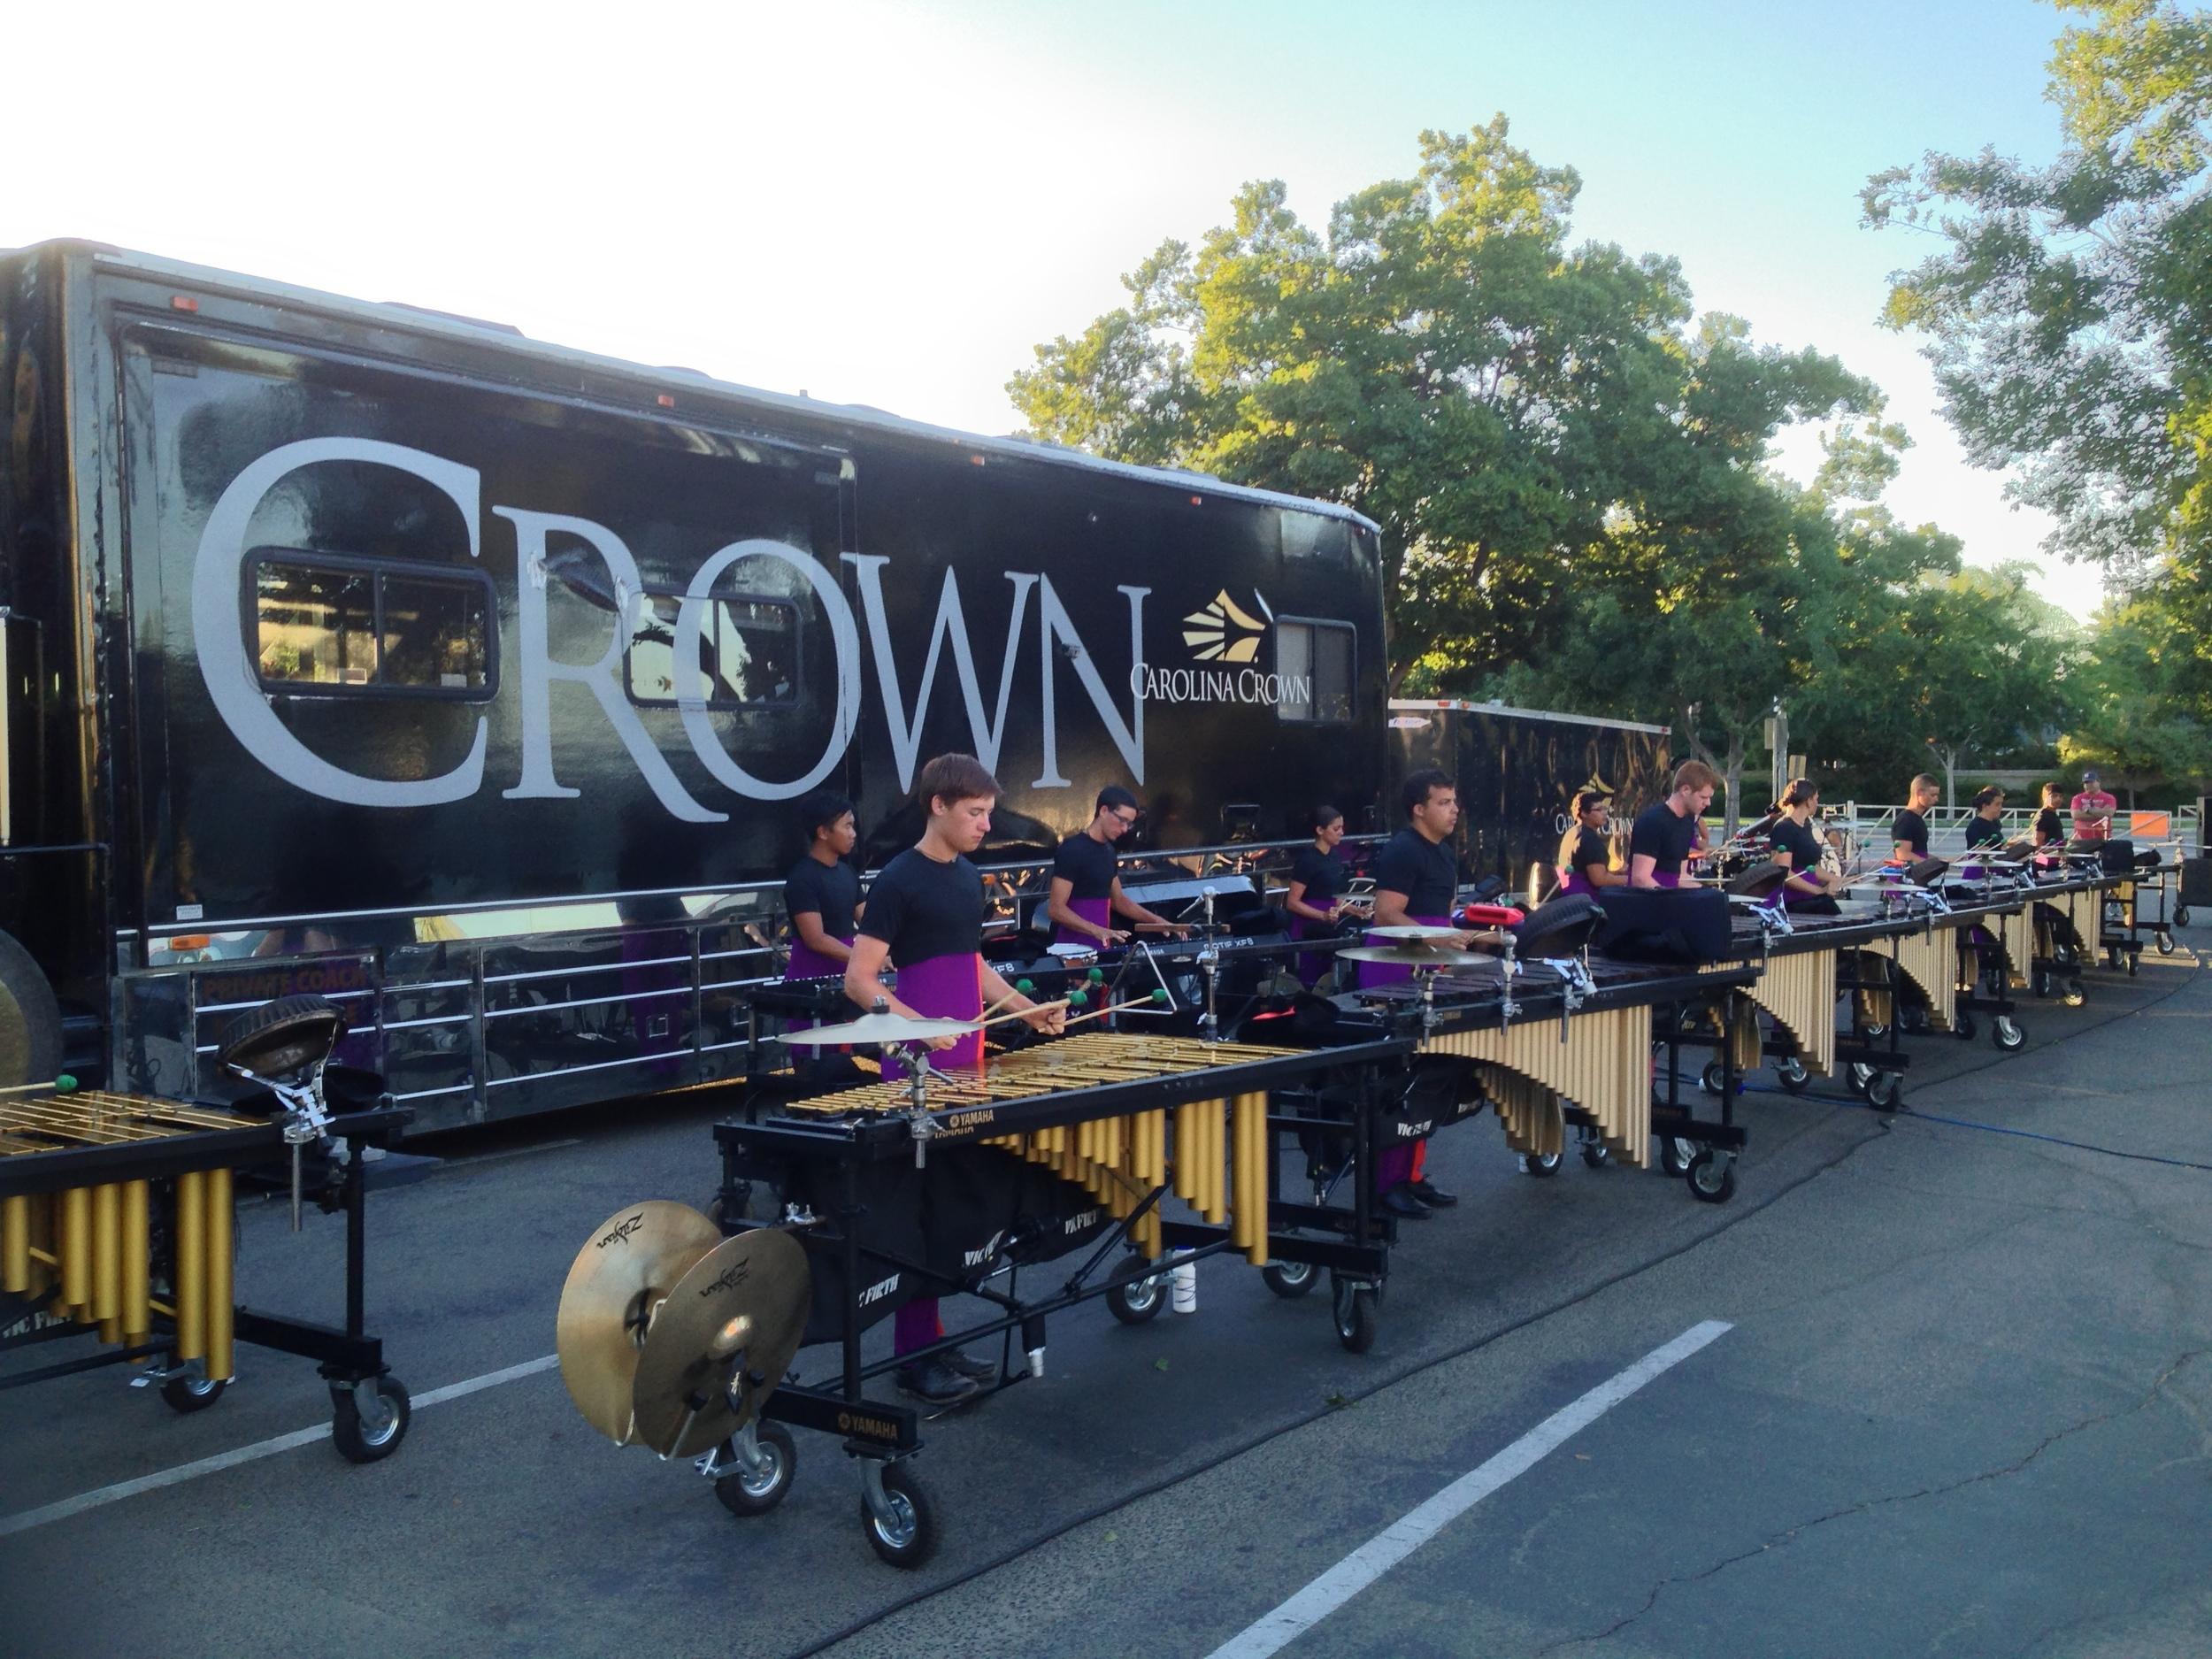 Carolina Crown 2013 Front Ensemble warming up in Clovis, CA